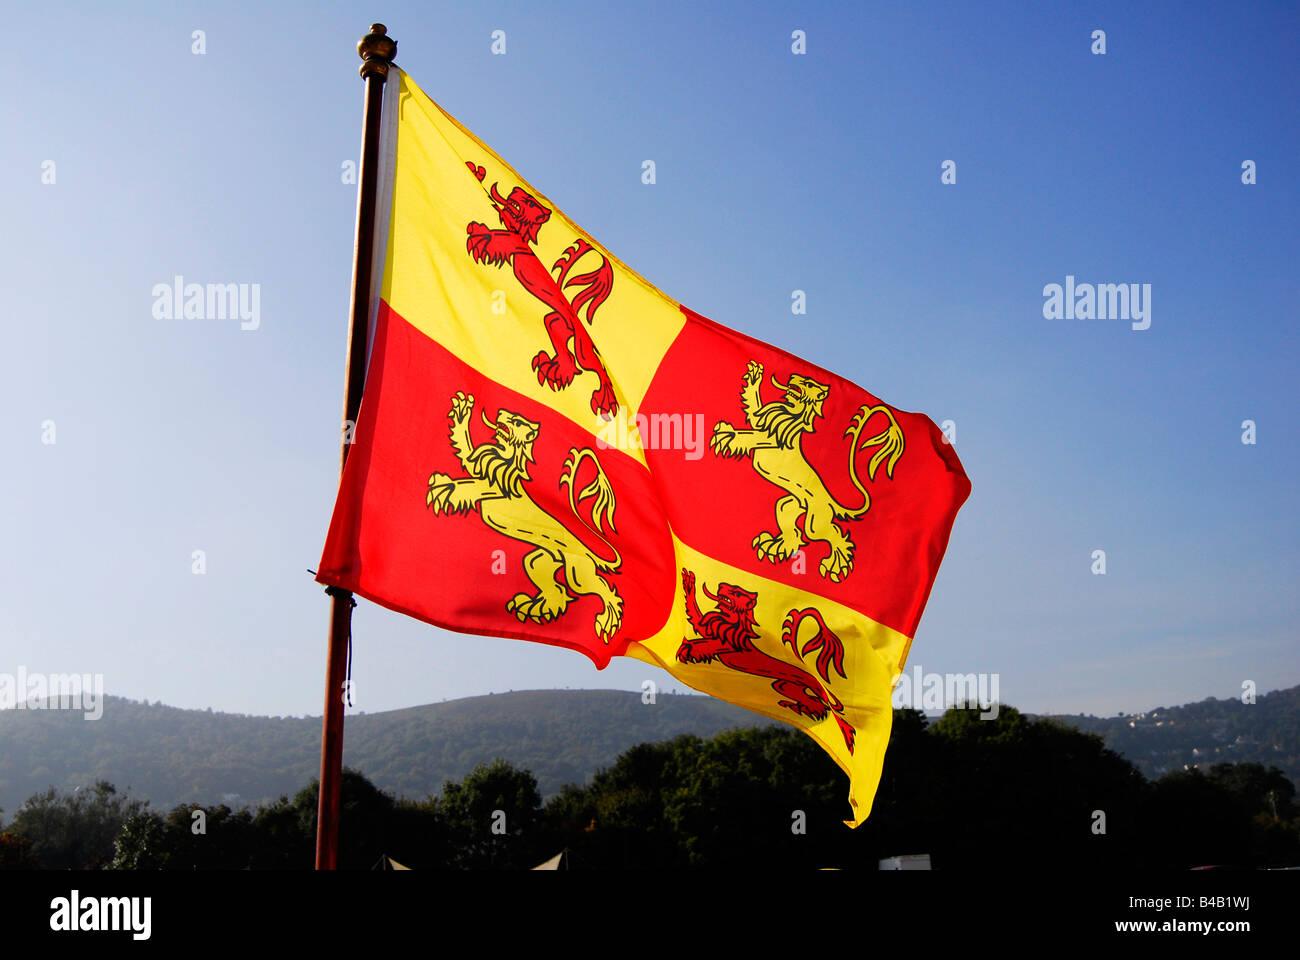 red and yellow lion rampant heraldic flag - Stock Image